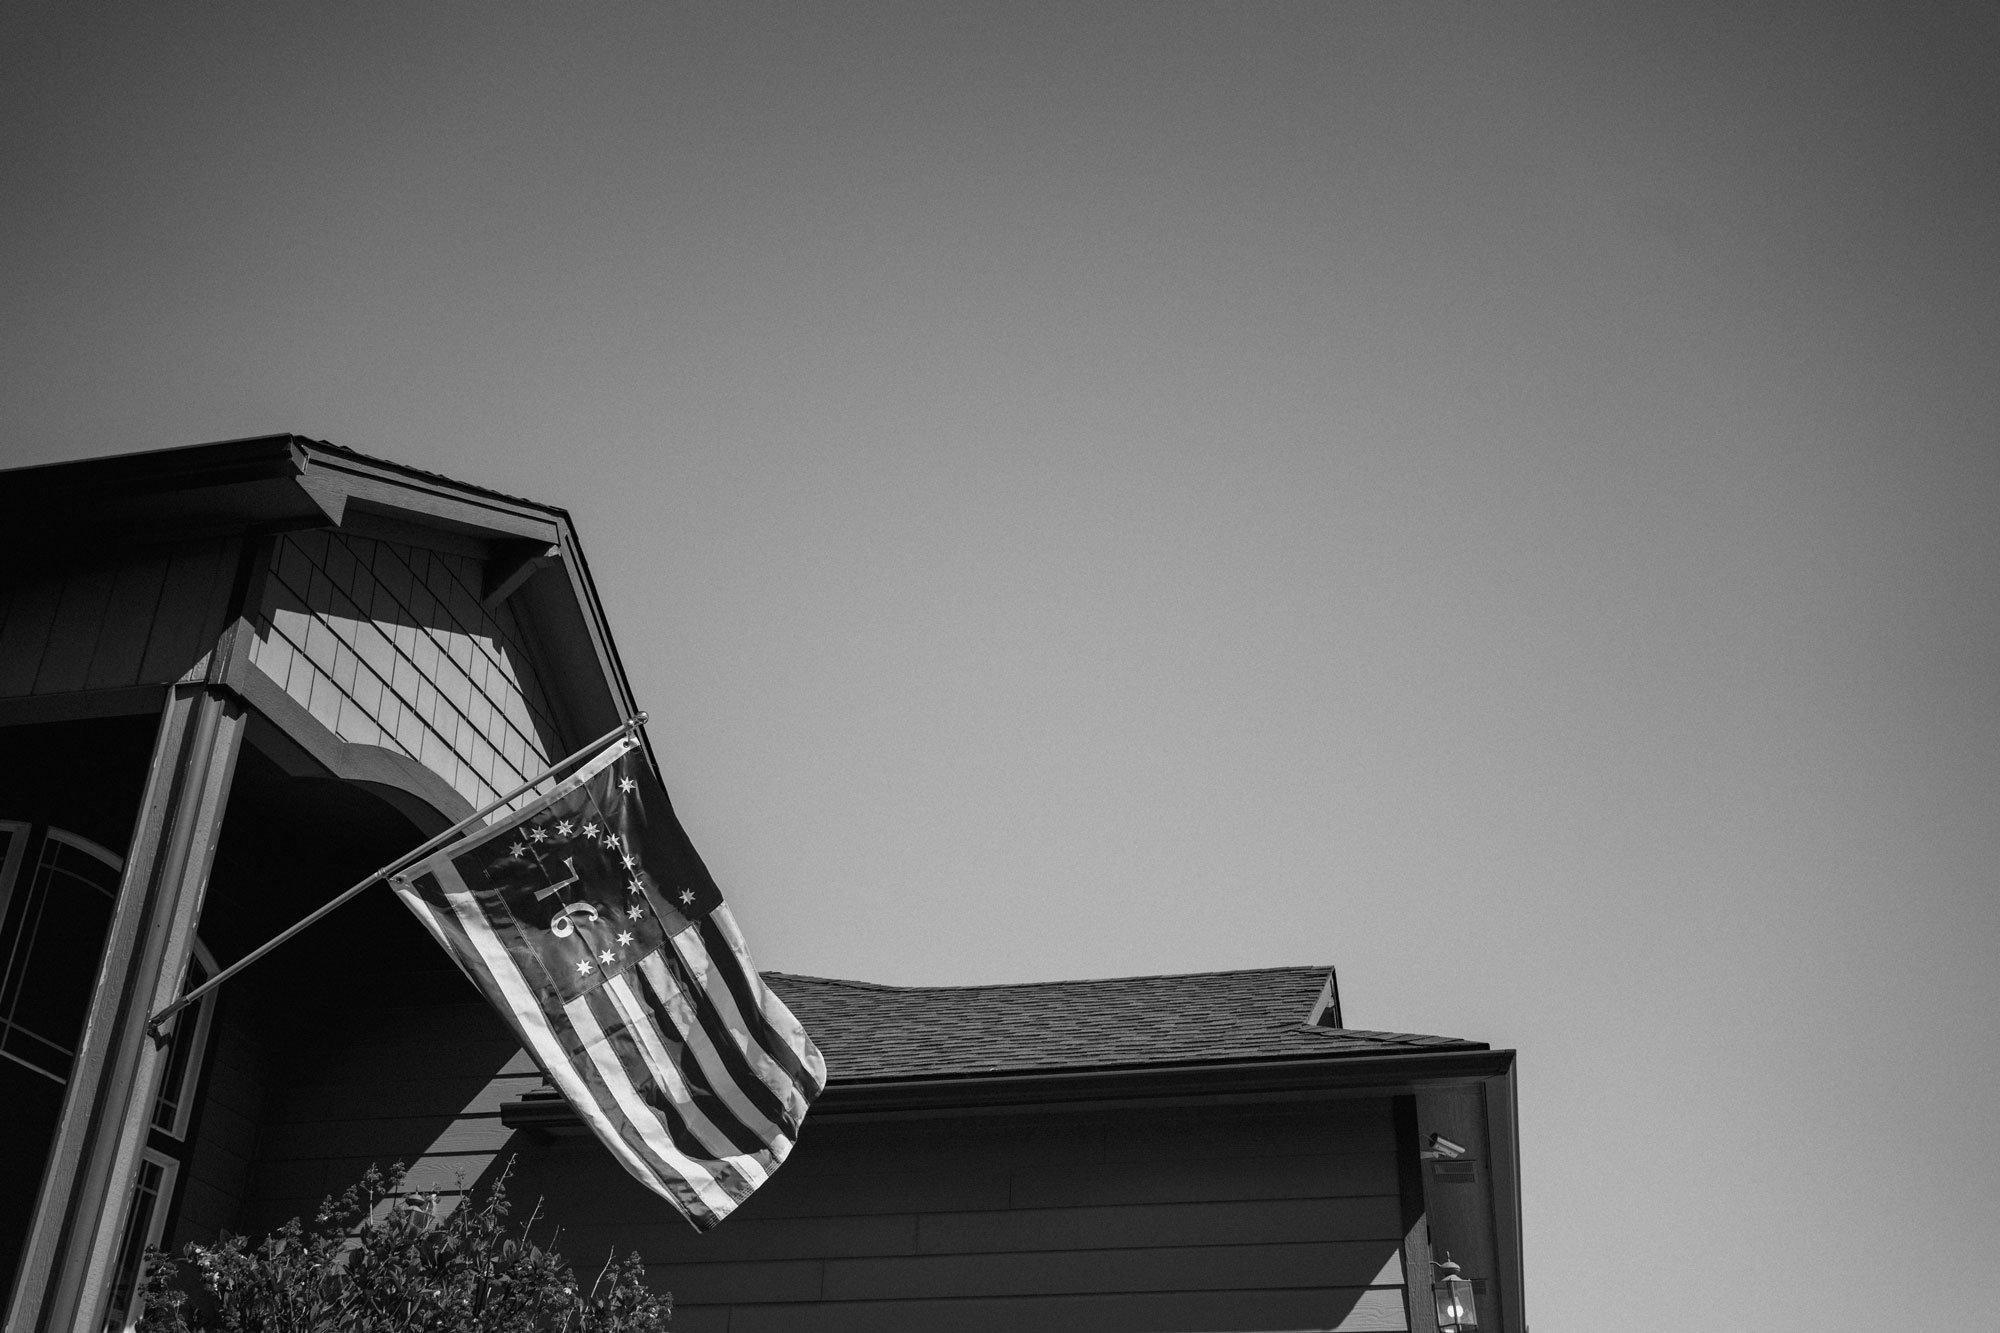 1776 flag waving in suburban home